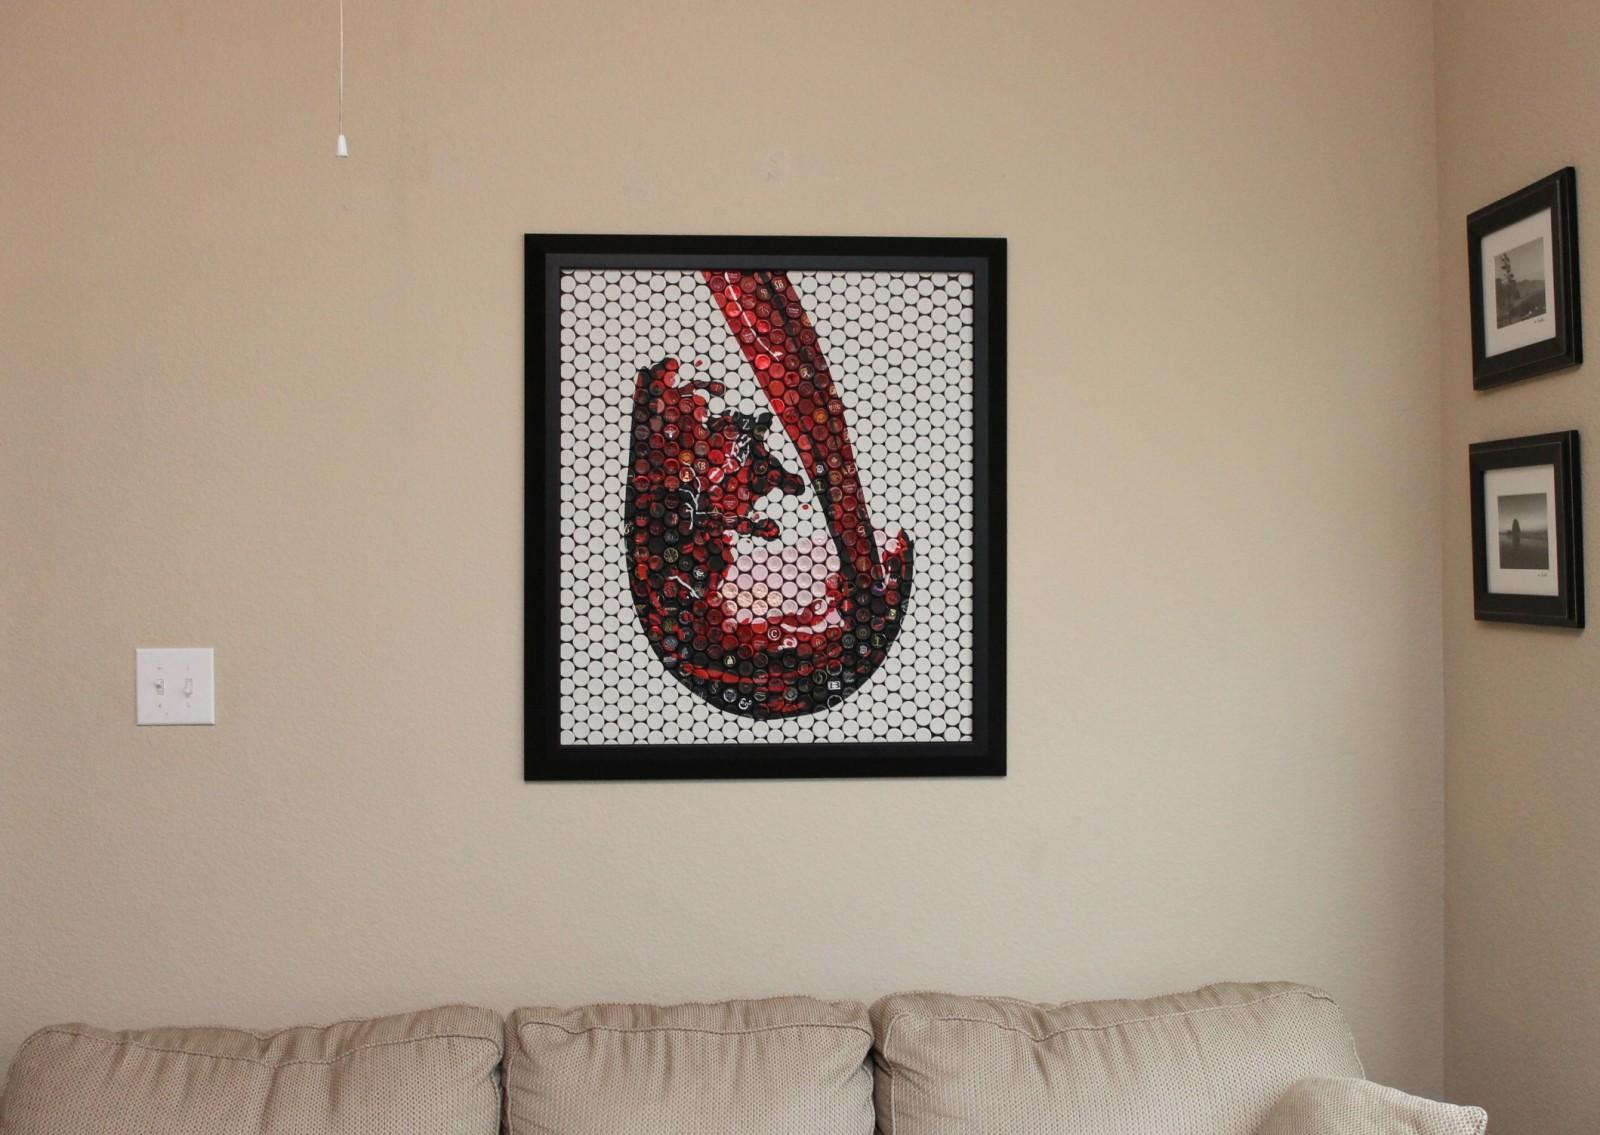 When wine inspires art. The story of Ryan Sorrell's stunning vinomosaics.